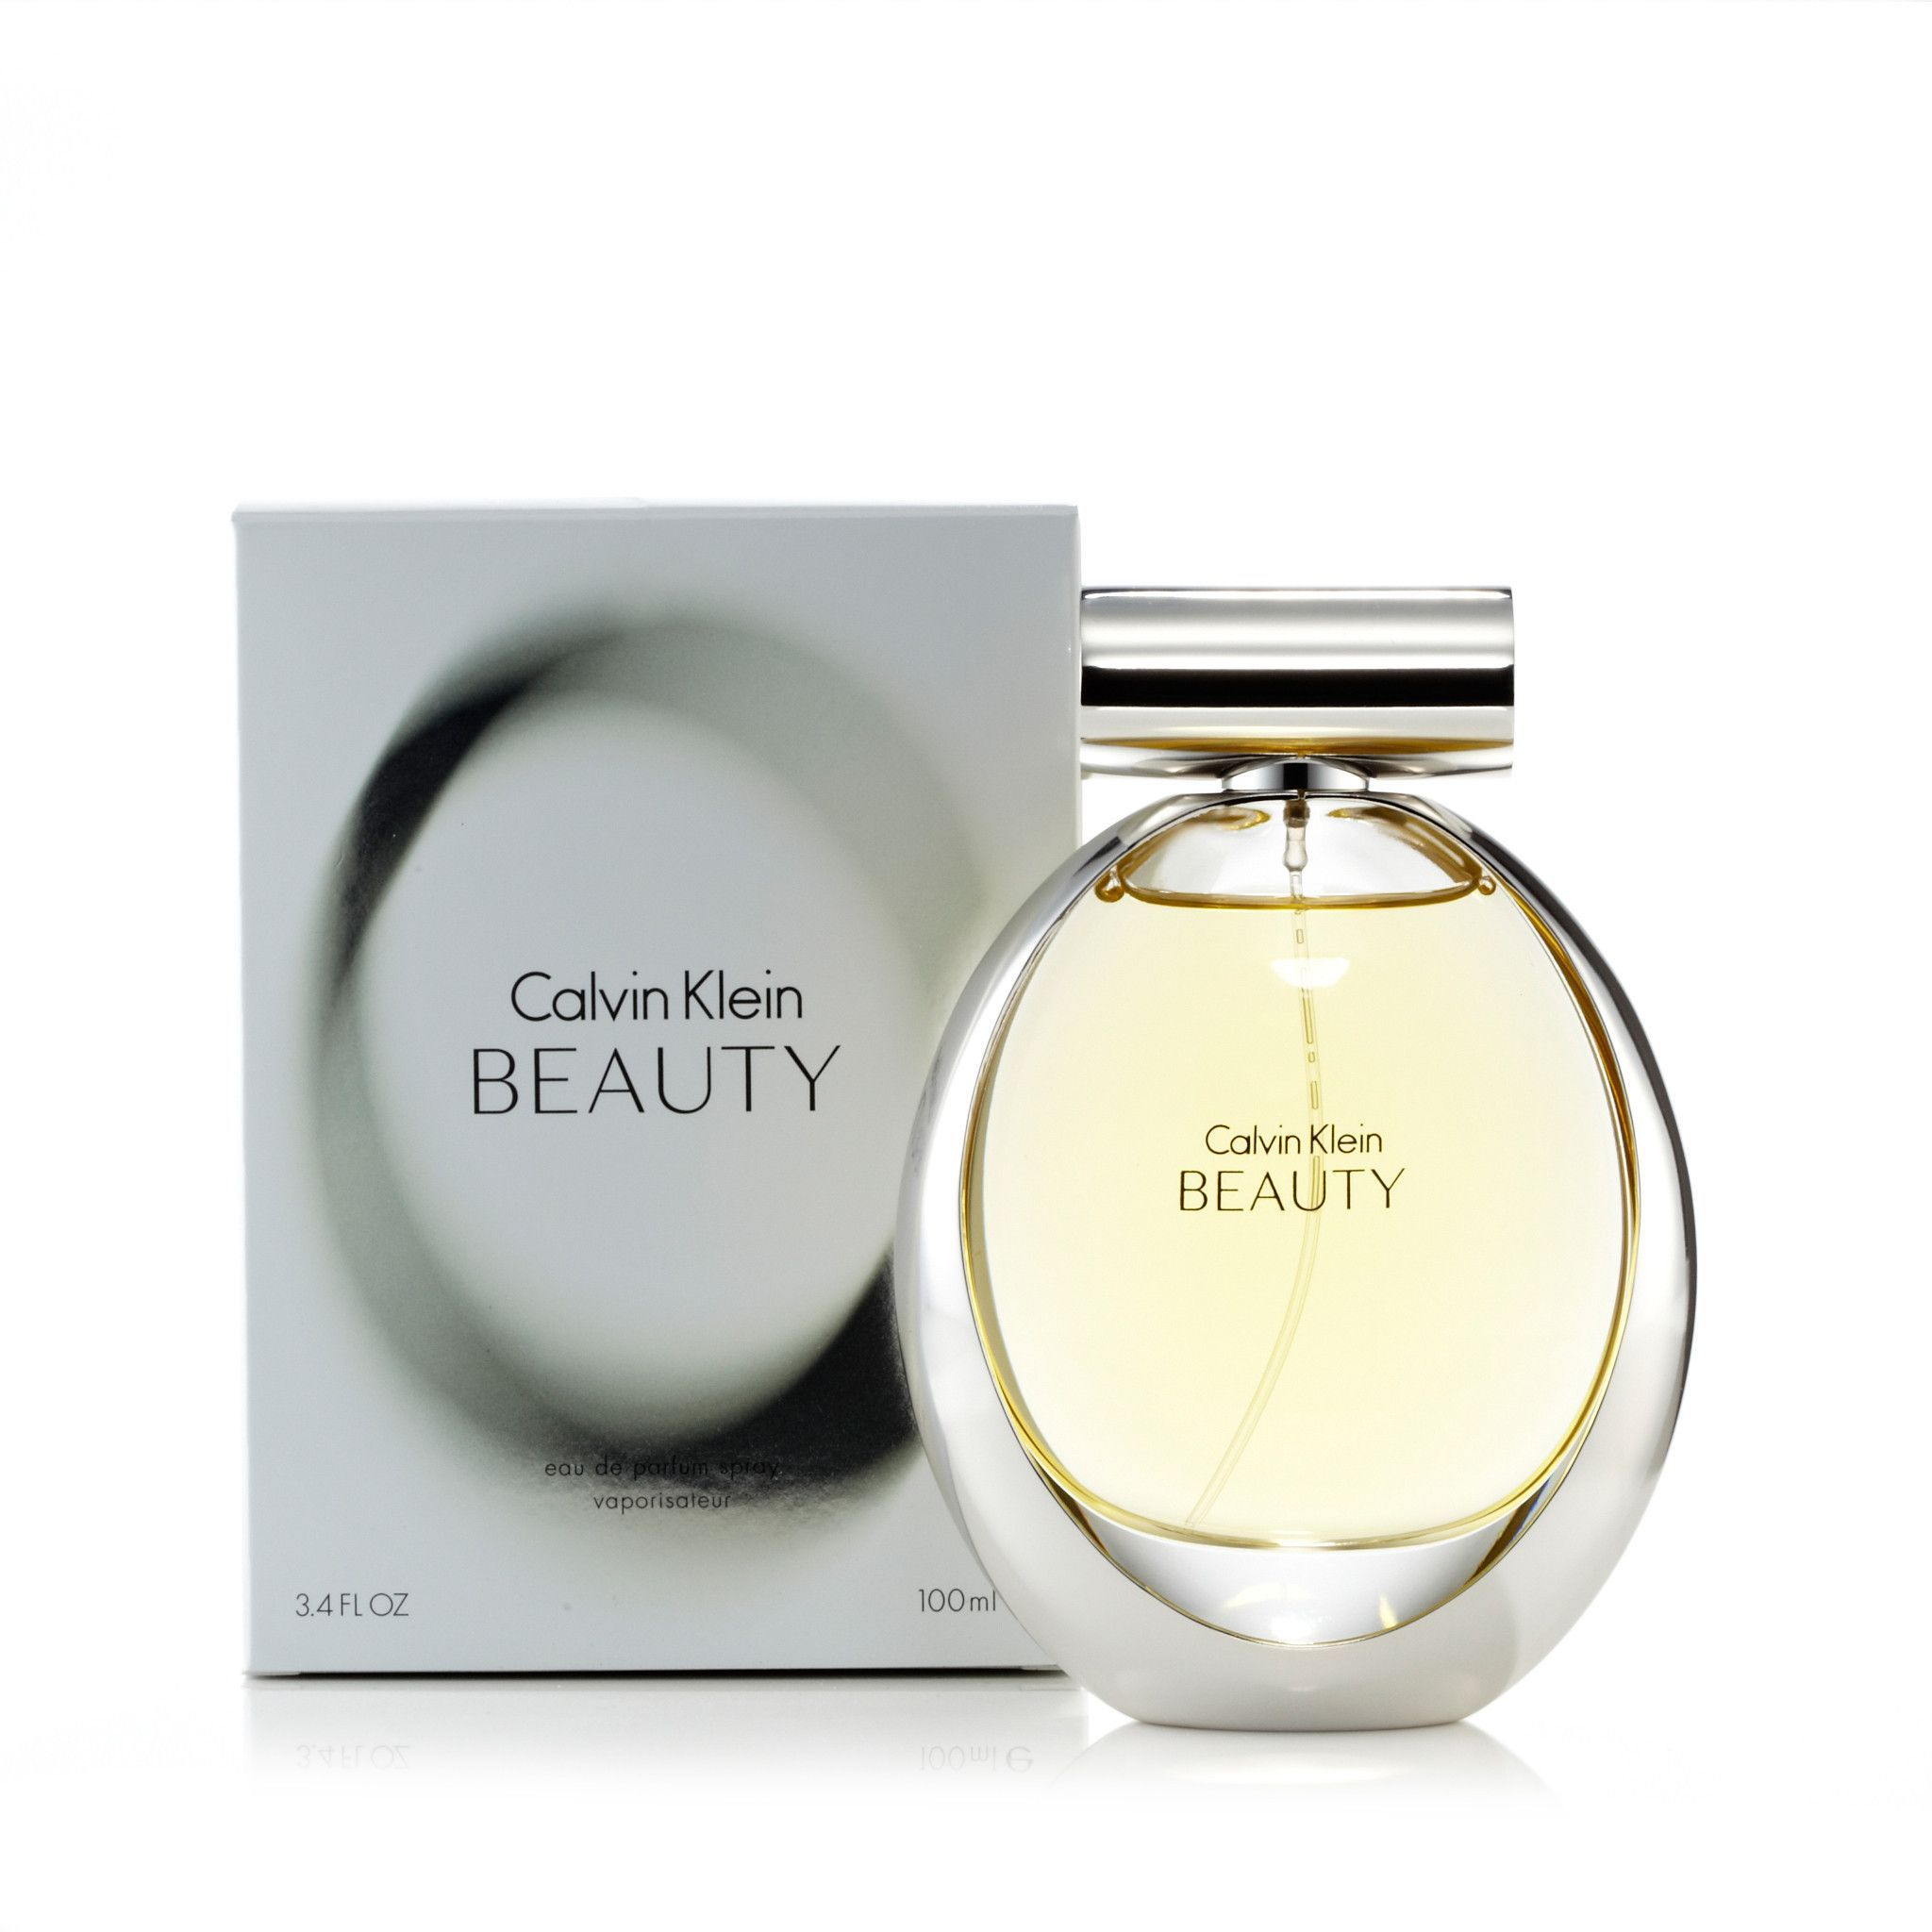 de393d34d Beauty Eau de Parfum Spray for Women by Calvin Klein in 2019 ...